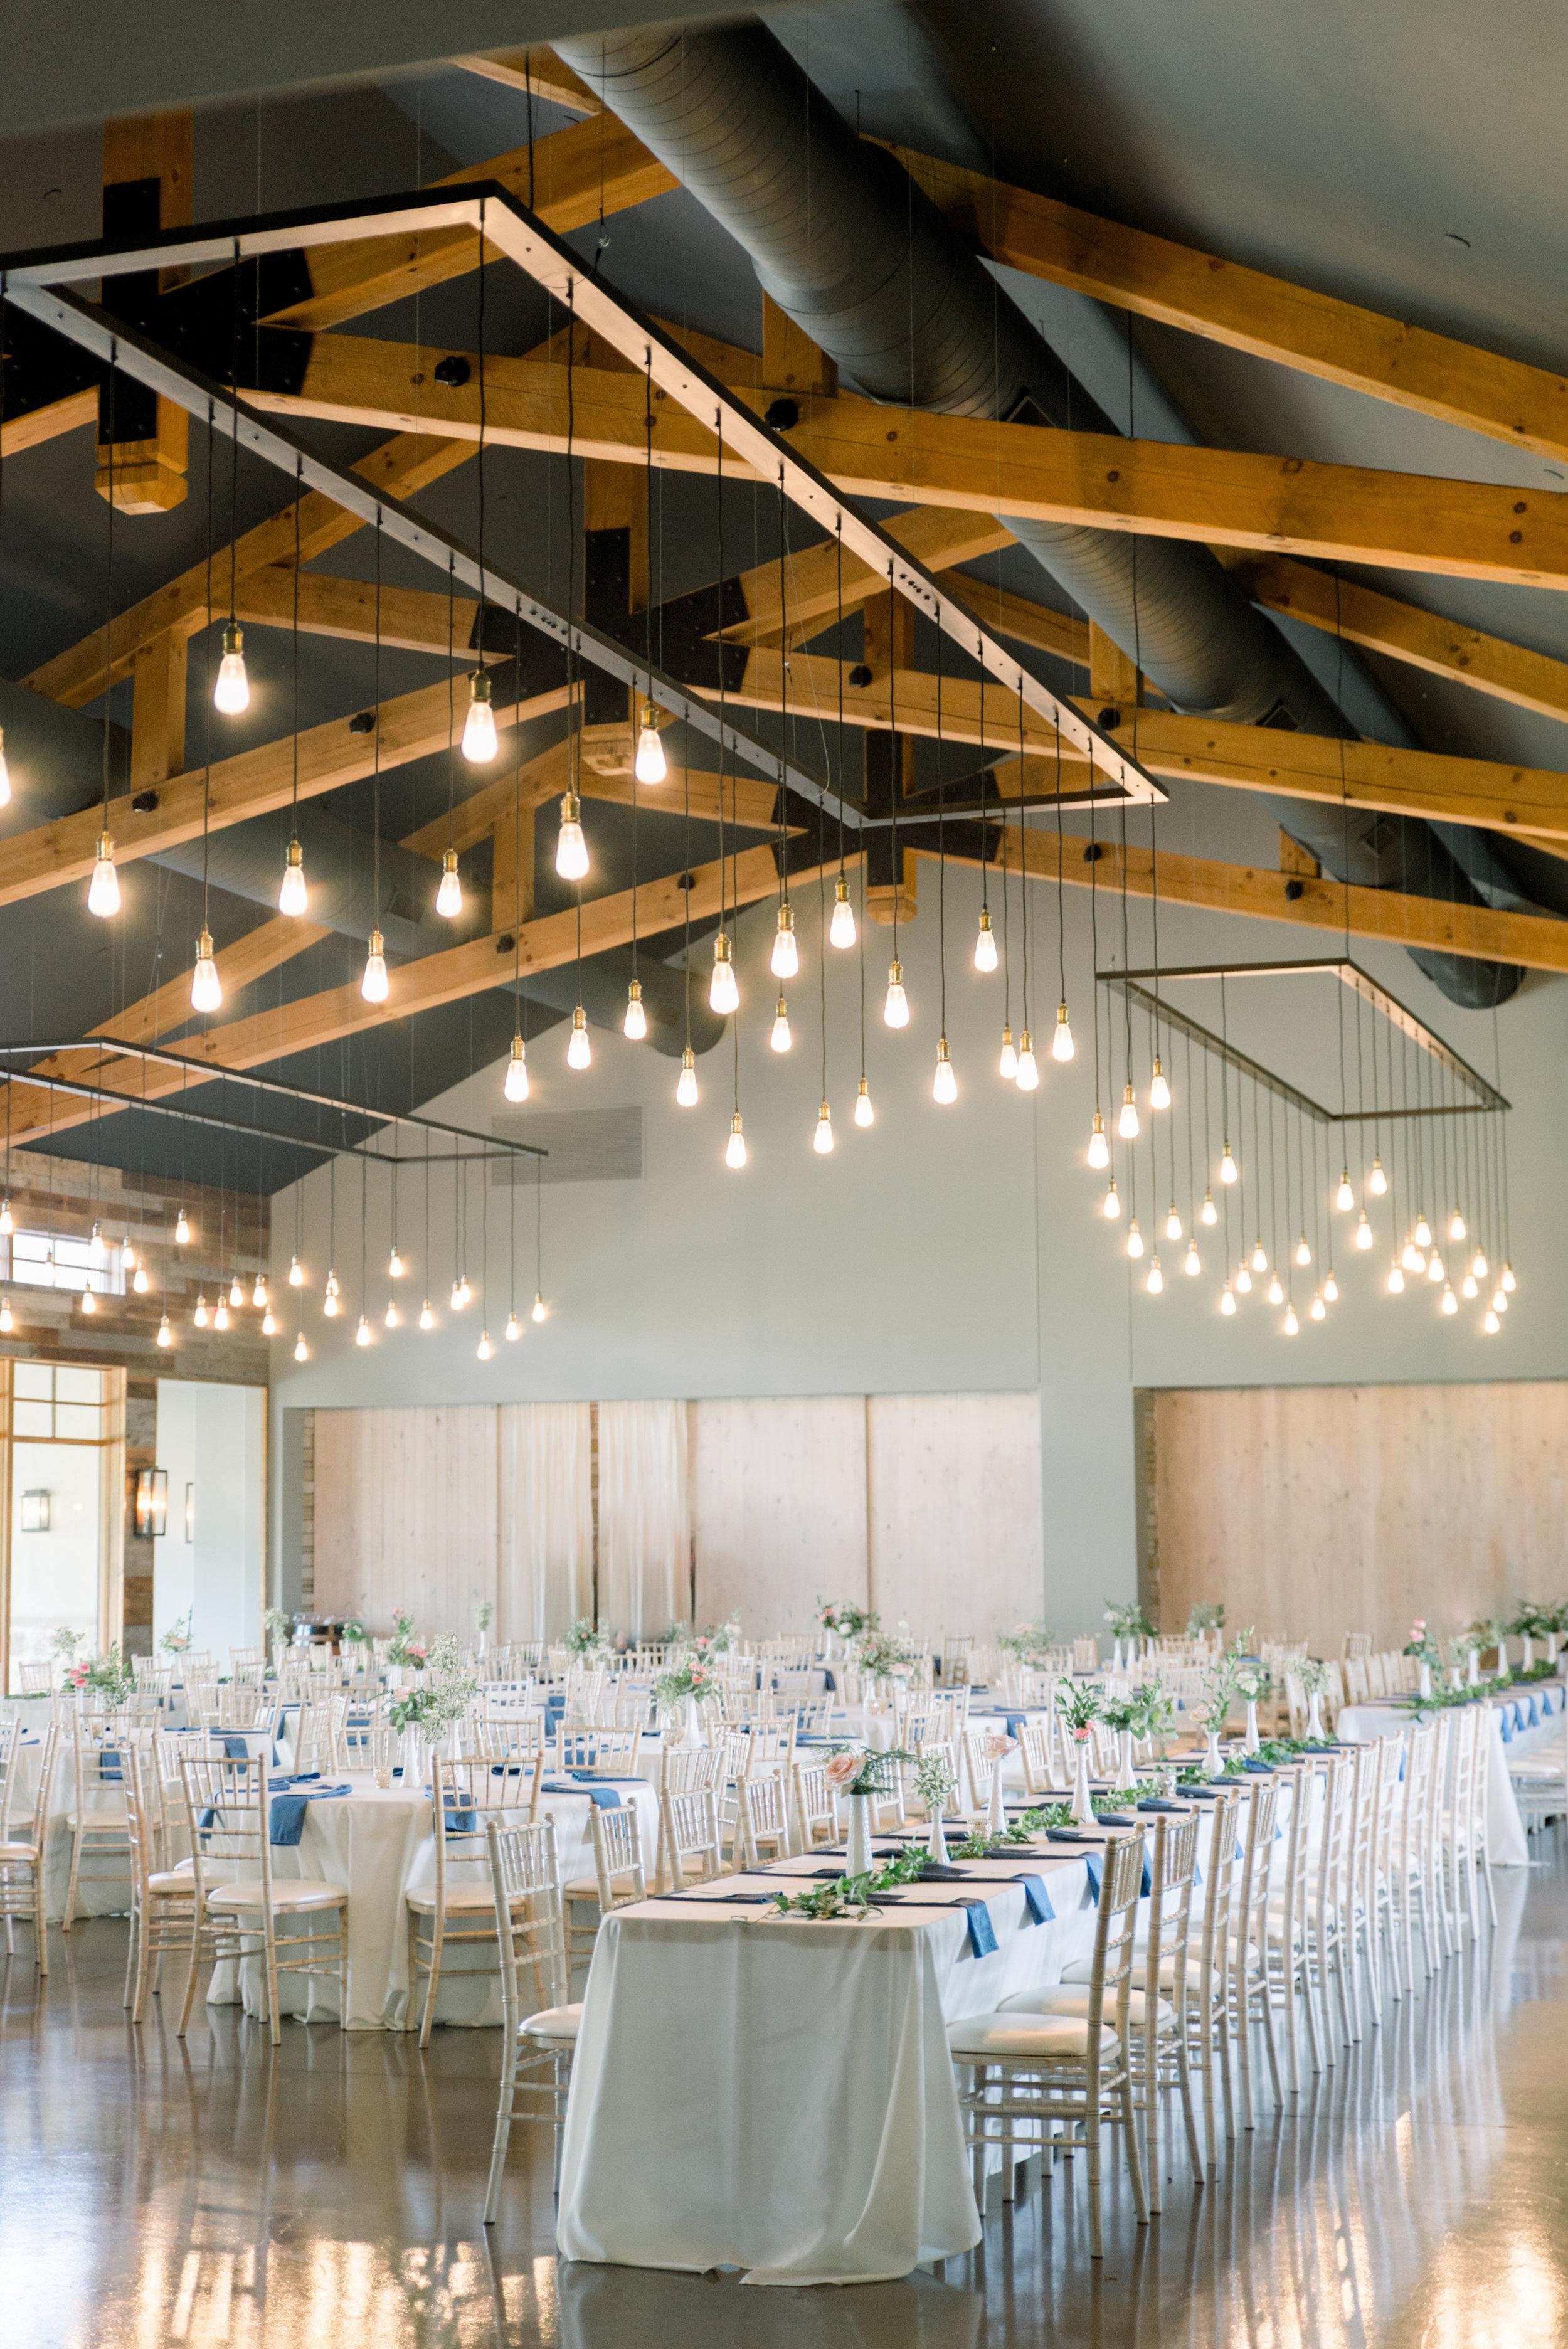 canyonwood ridge wedding coordinator epoch co+ destination wedding dusty blue blush inspiration